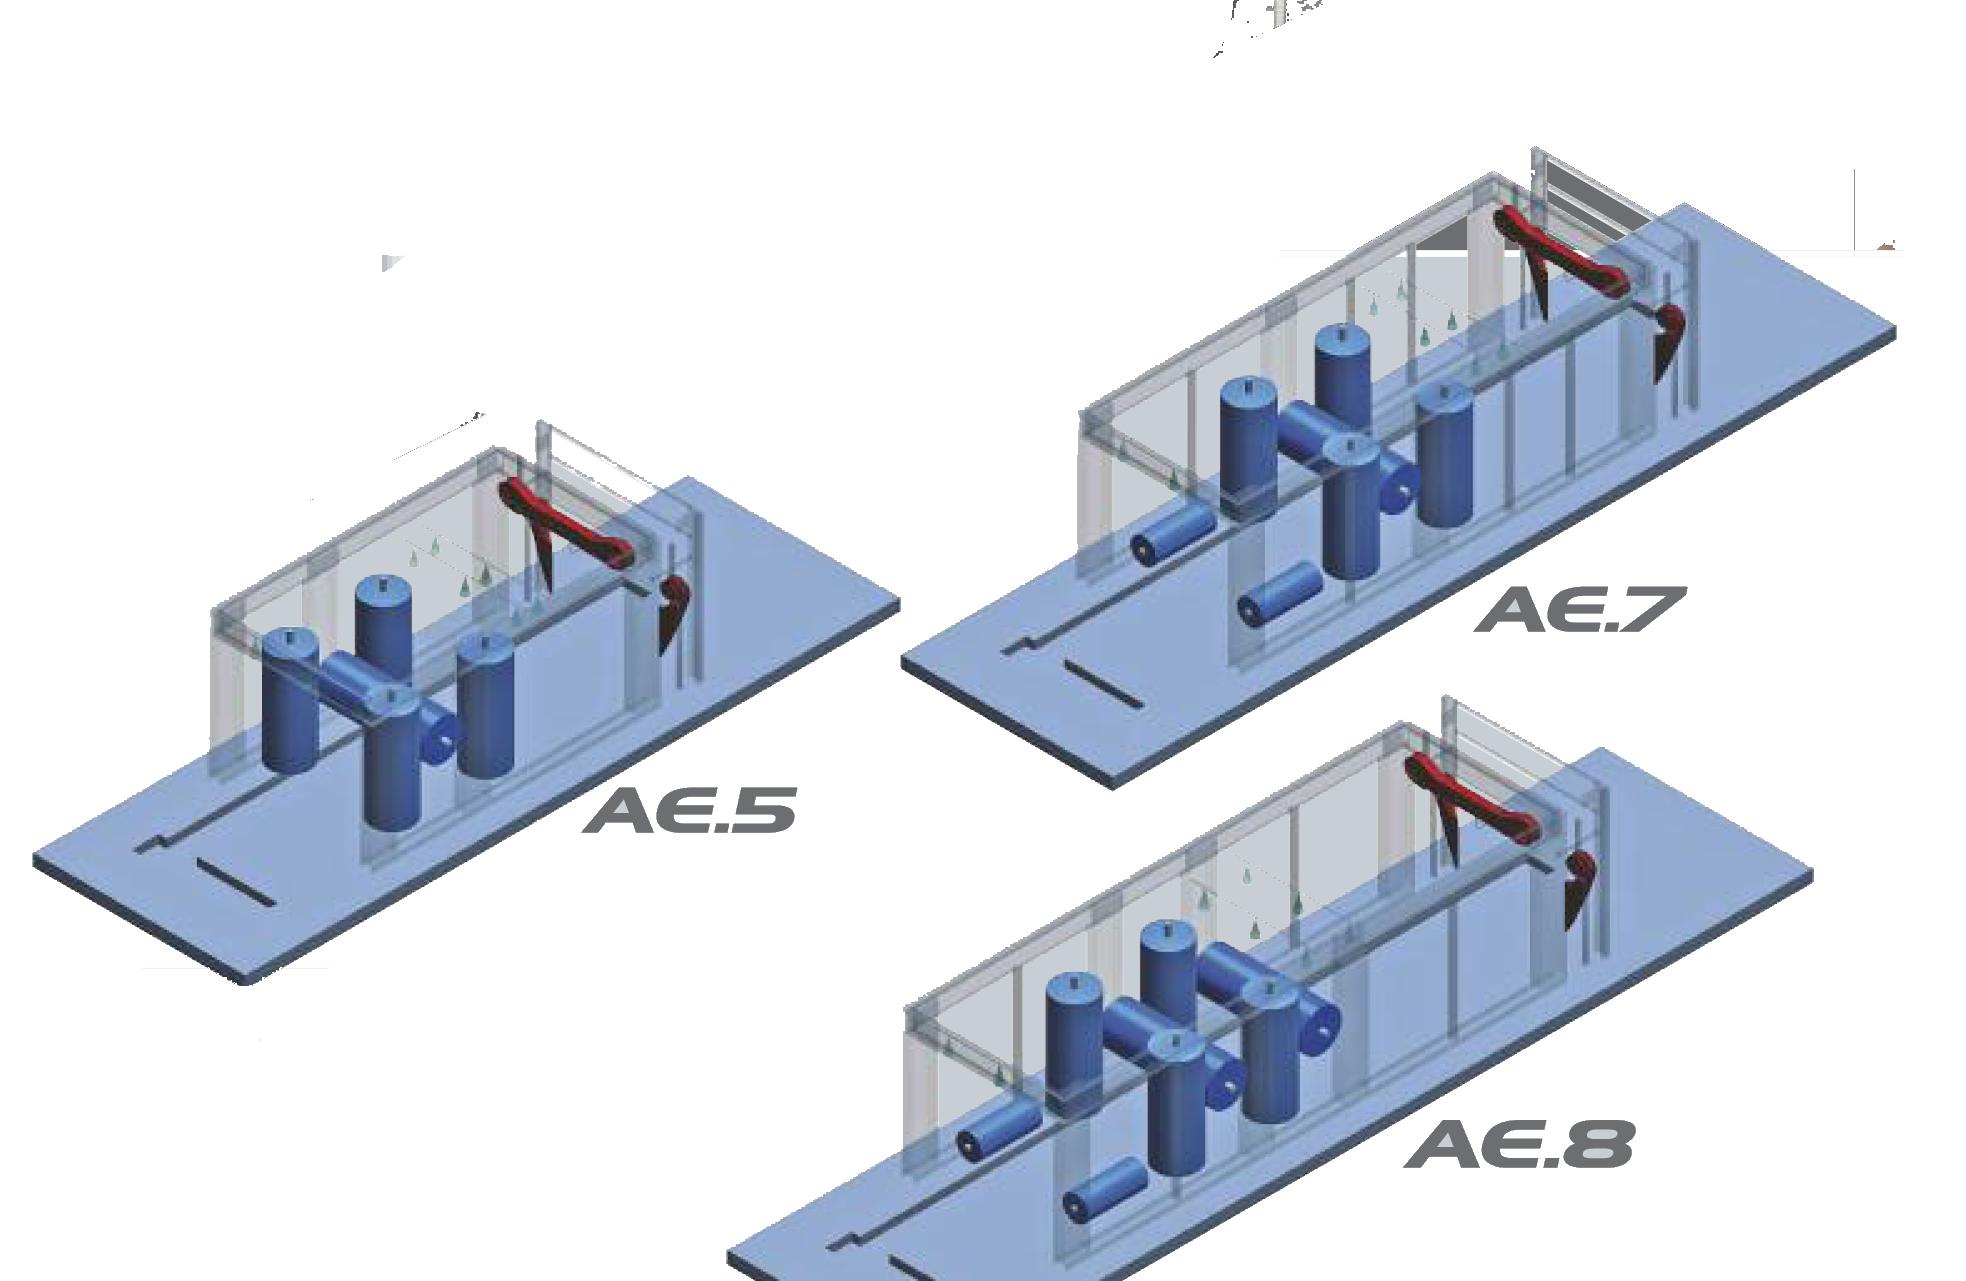 Schematy myjni tunelowych: AE.5, AE.7, AE.8